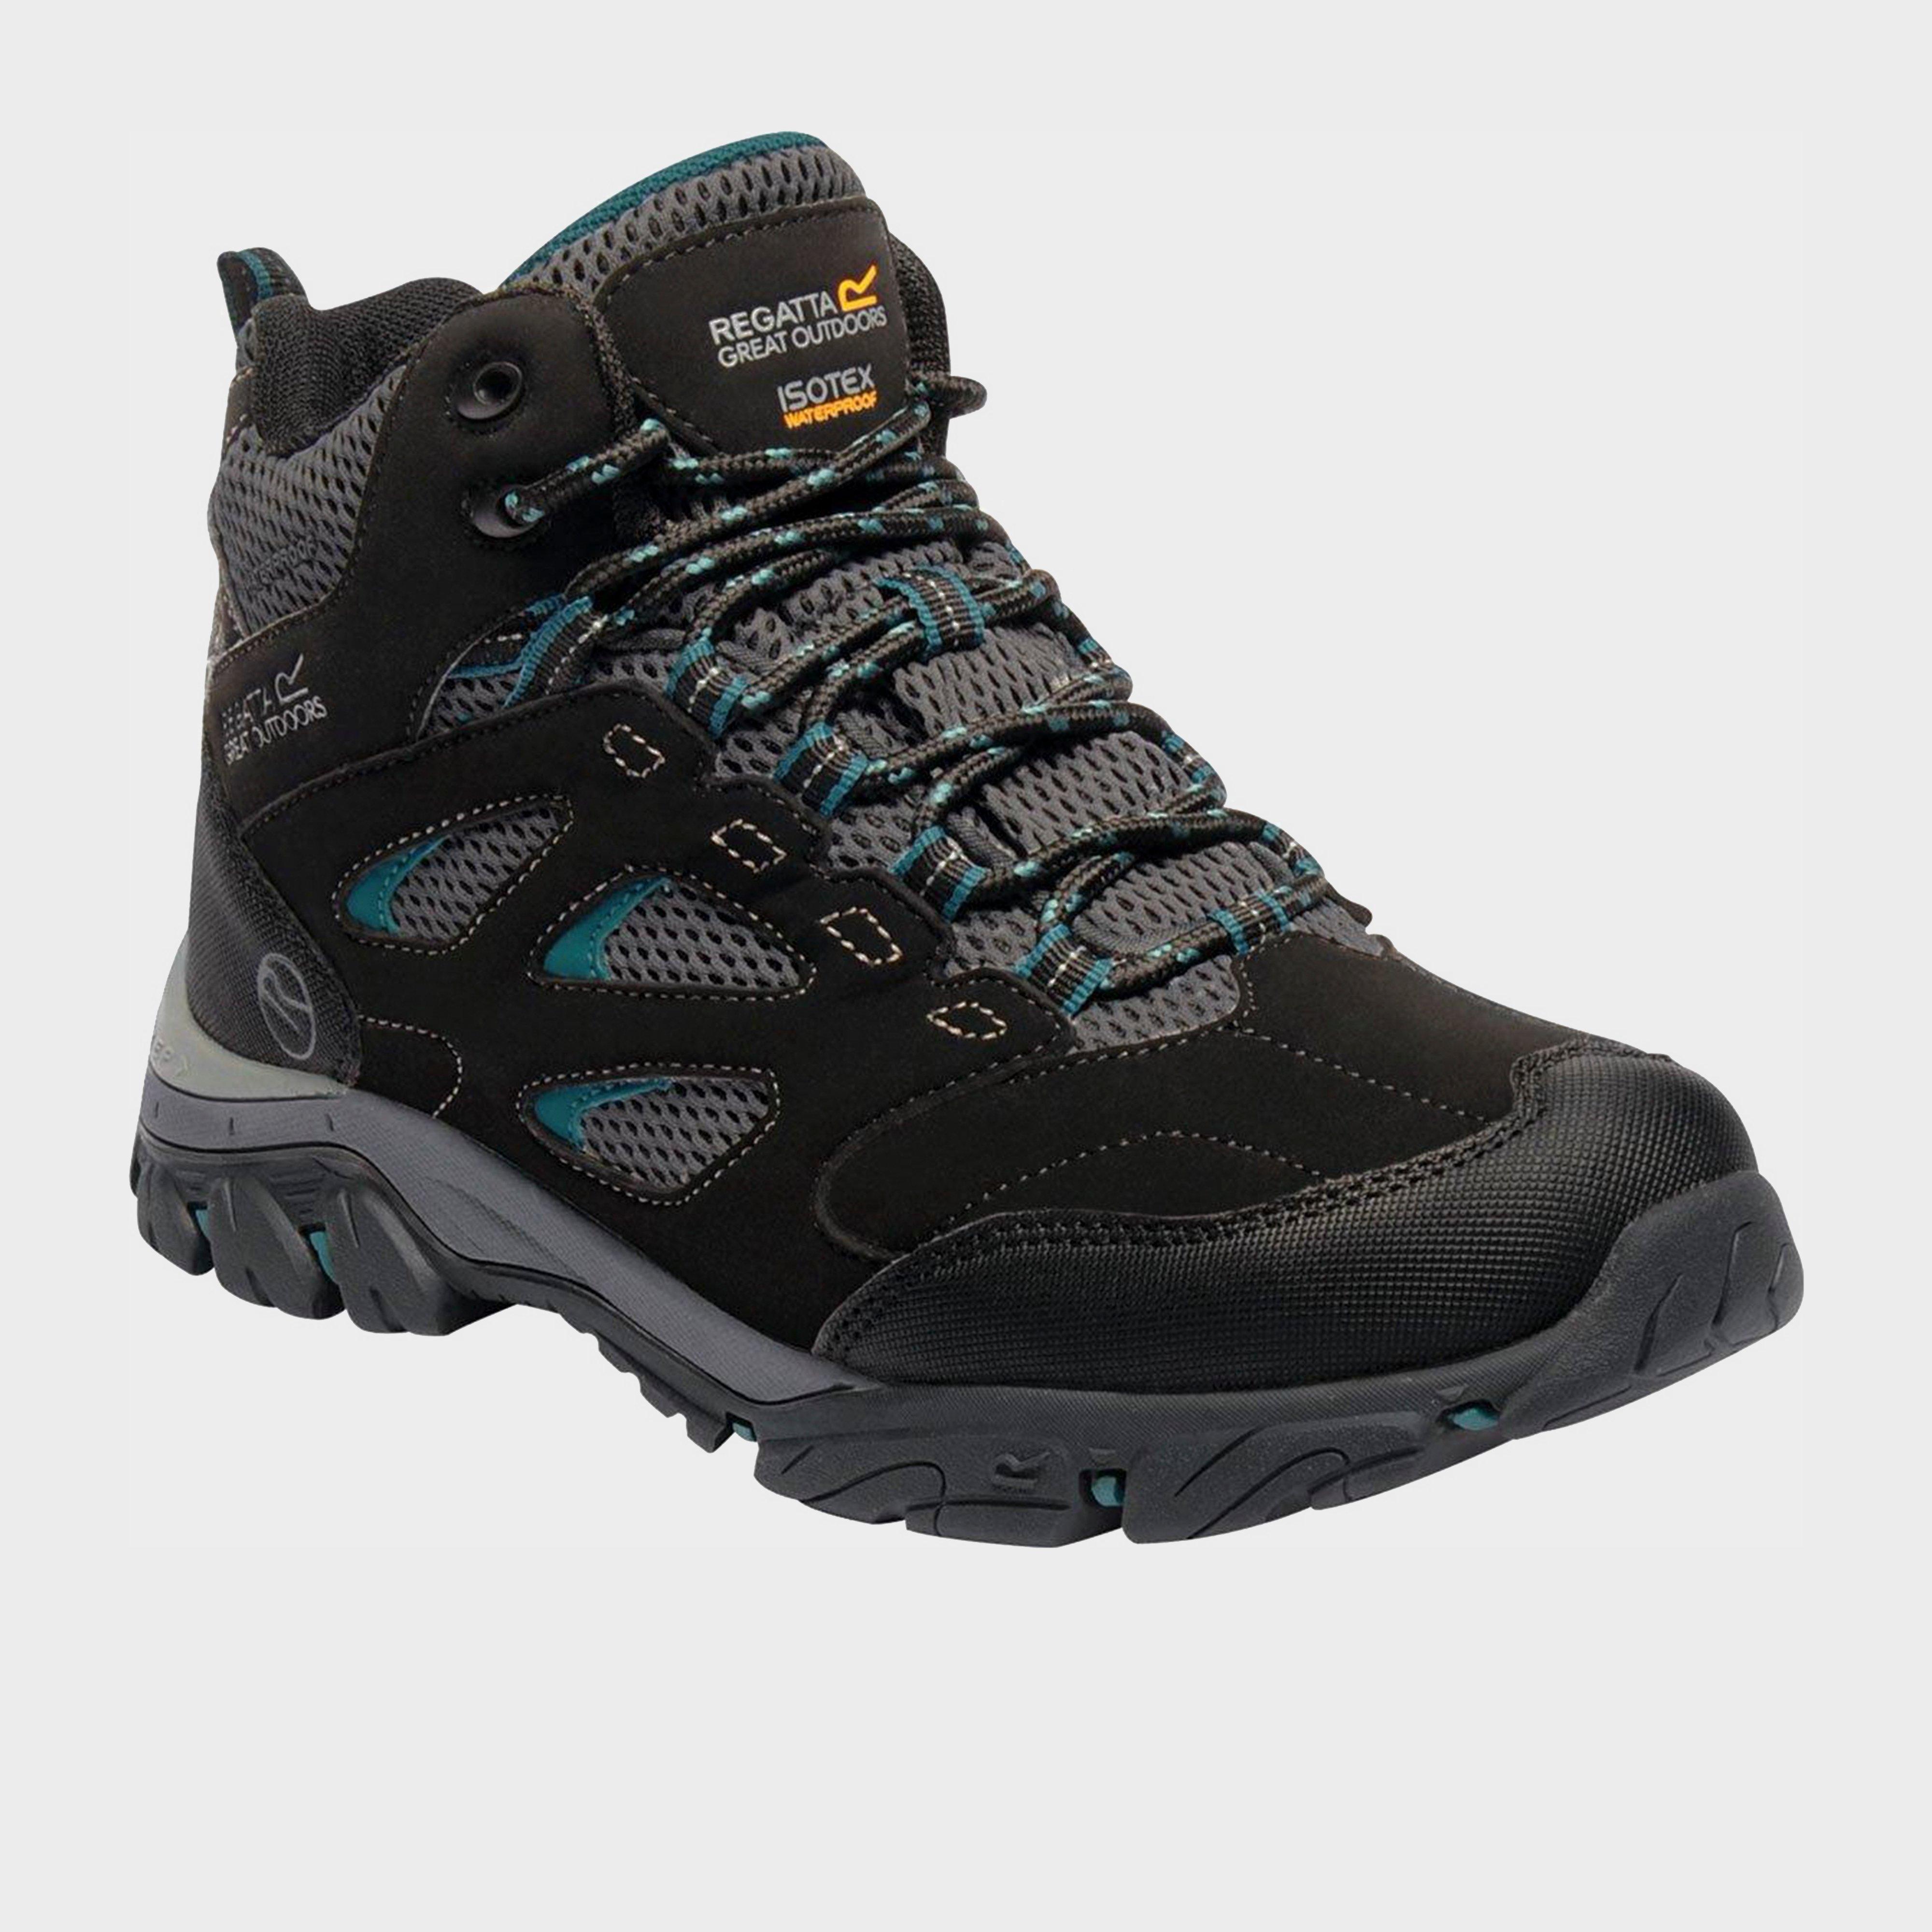 Regatta Women's Holcombe Iep Mid Walking Boots - Womens/Womens, WOMENS/WOMENS